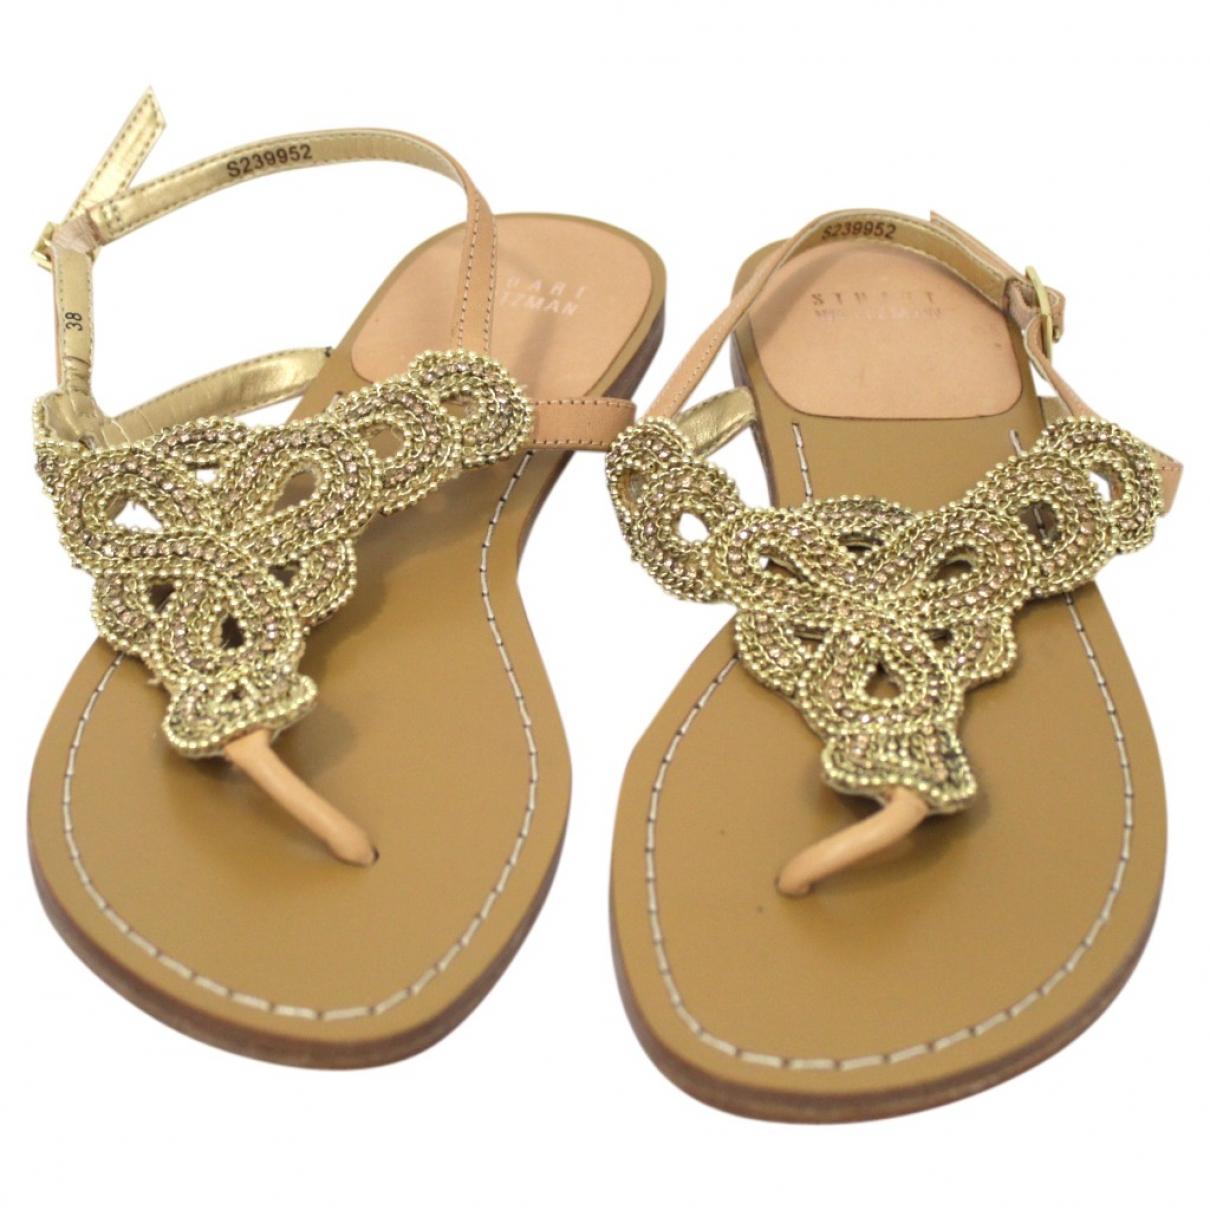 Stuart Weitzman \N Gold Leather Sandals for Women 38 EU